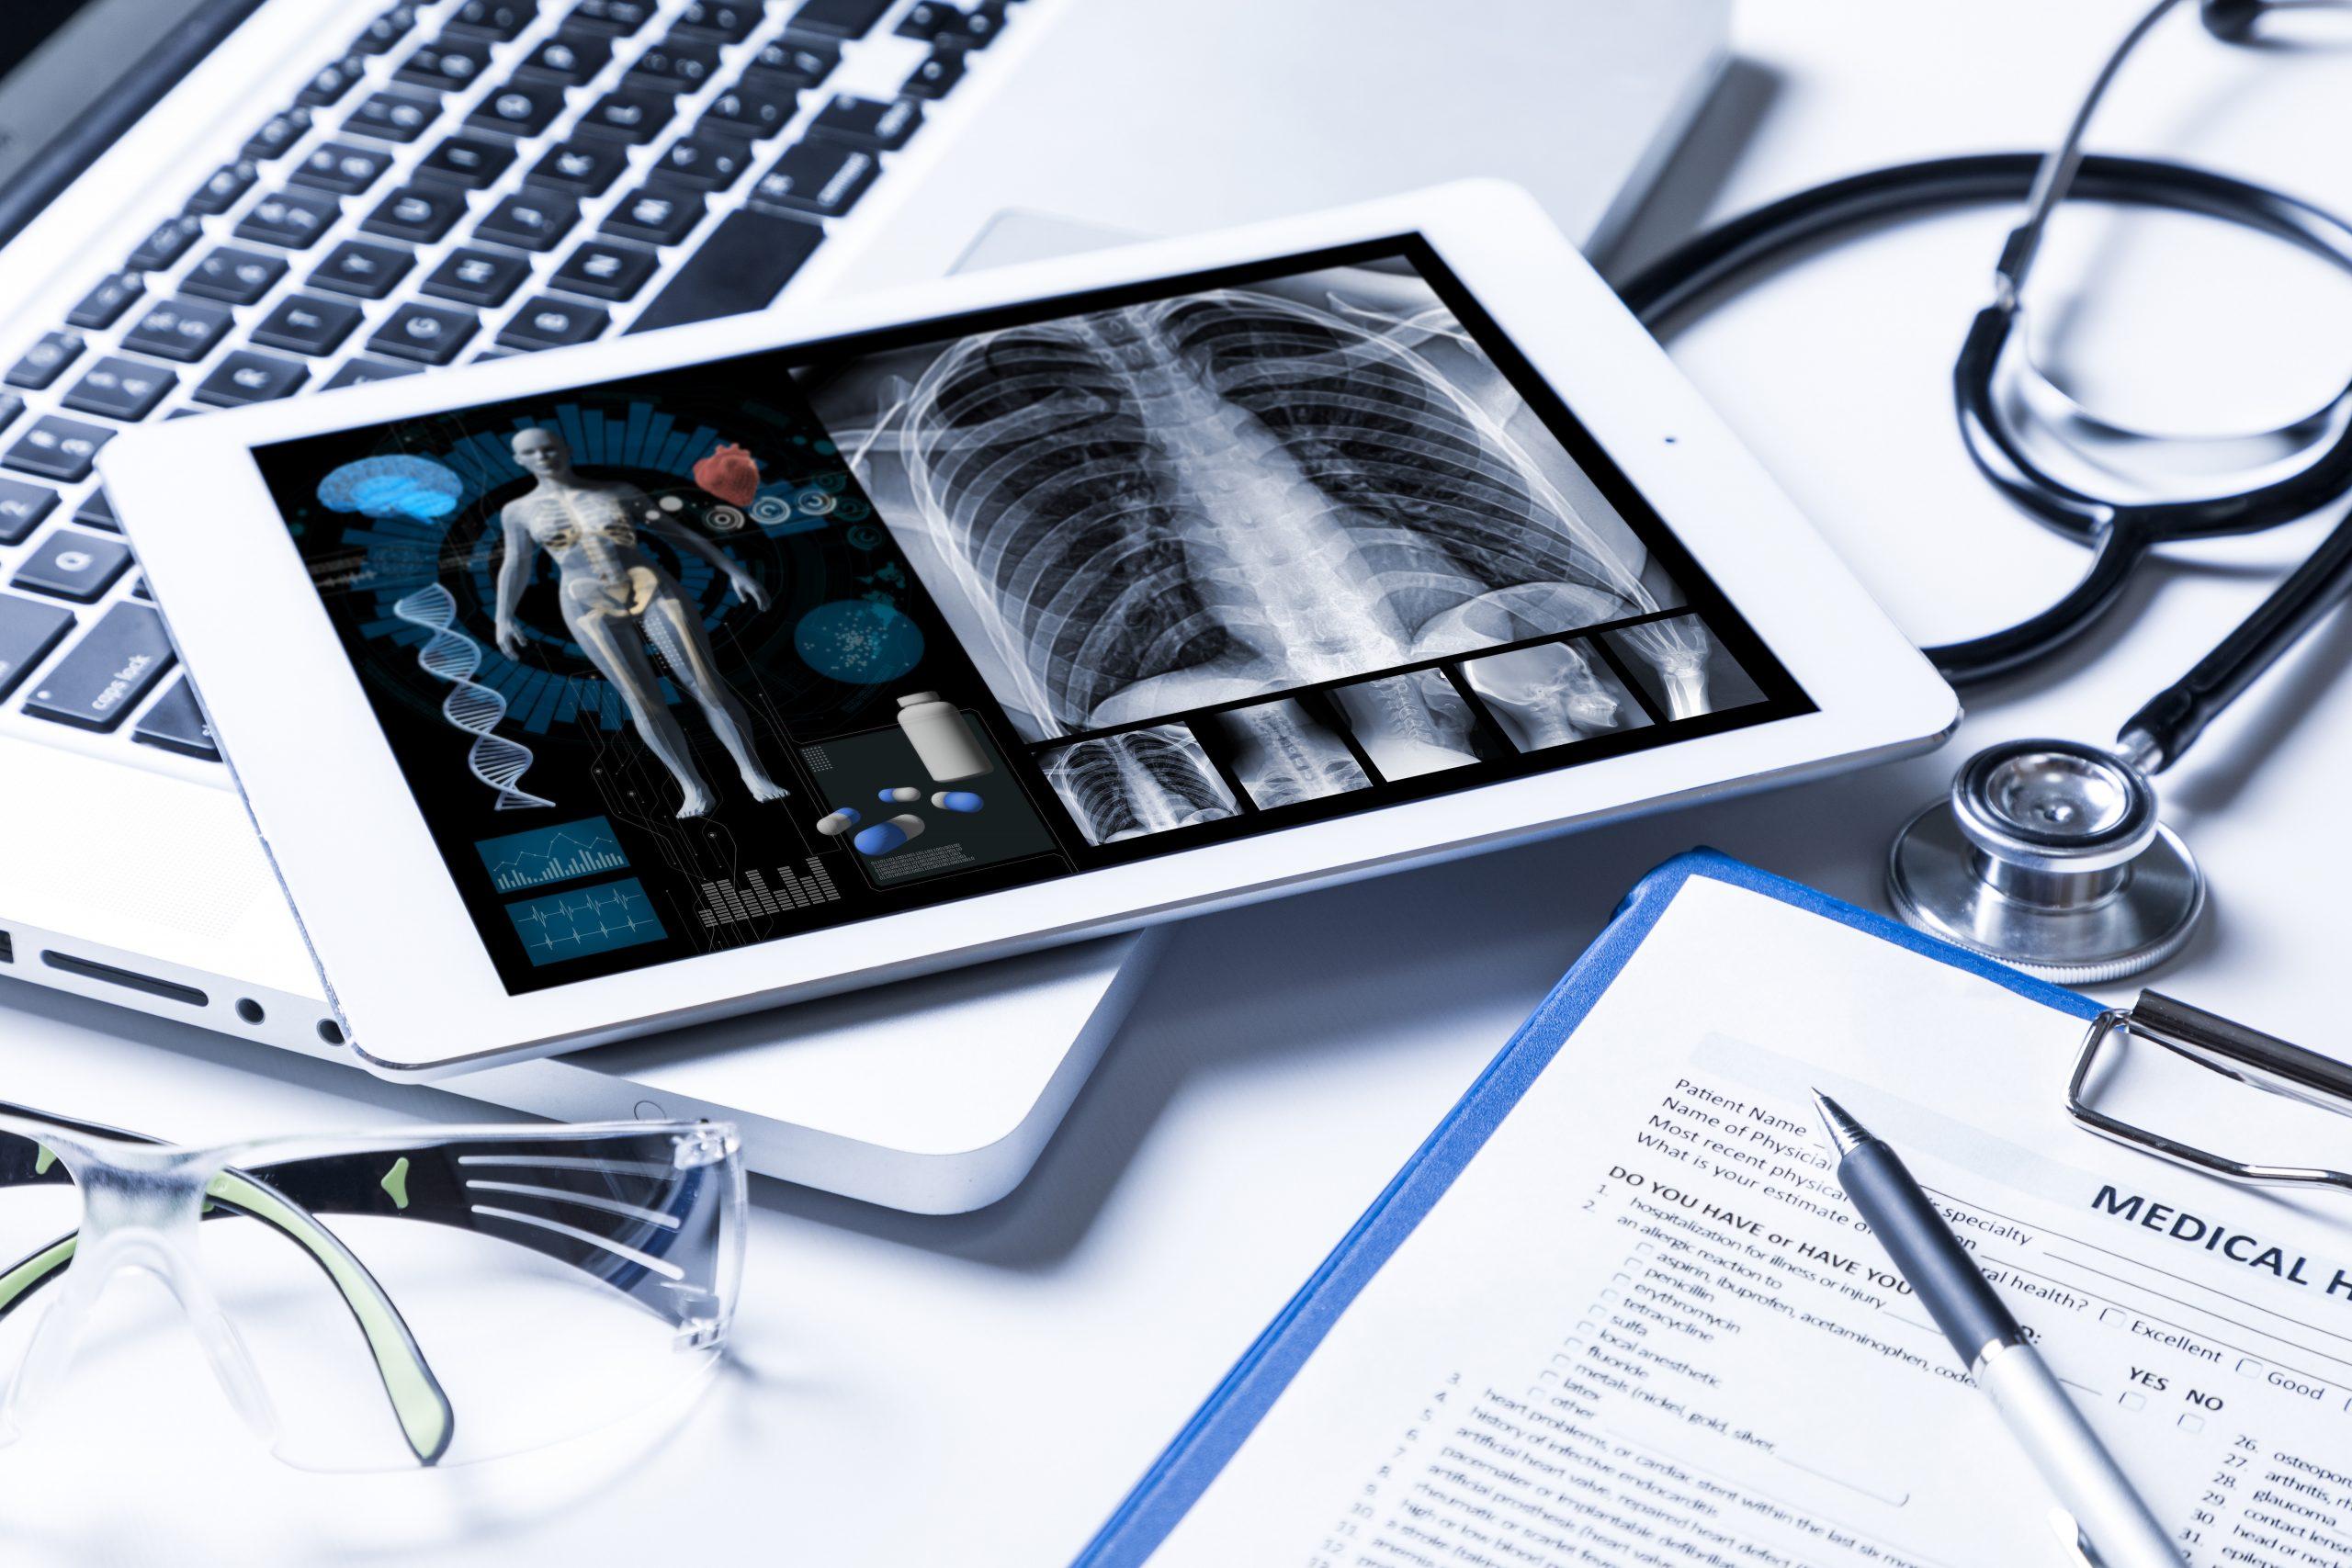 Medical device diagnosis